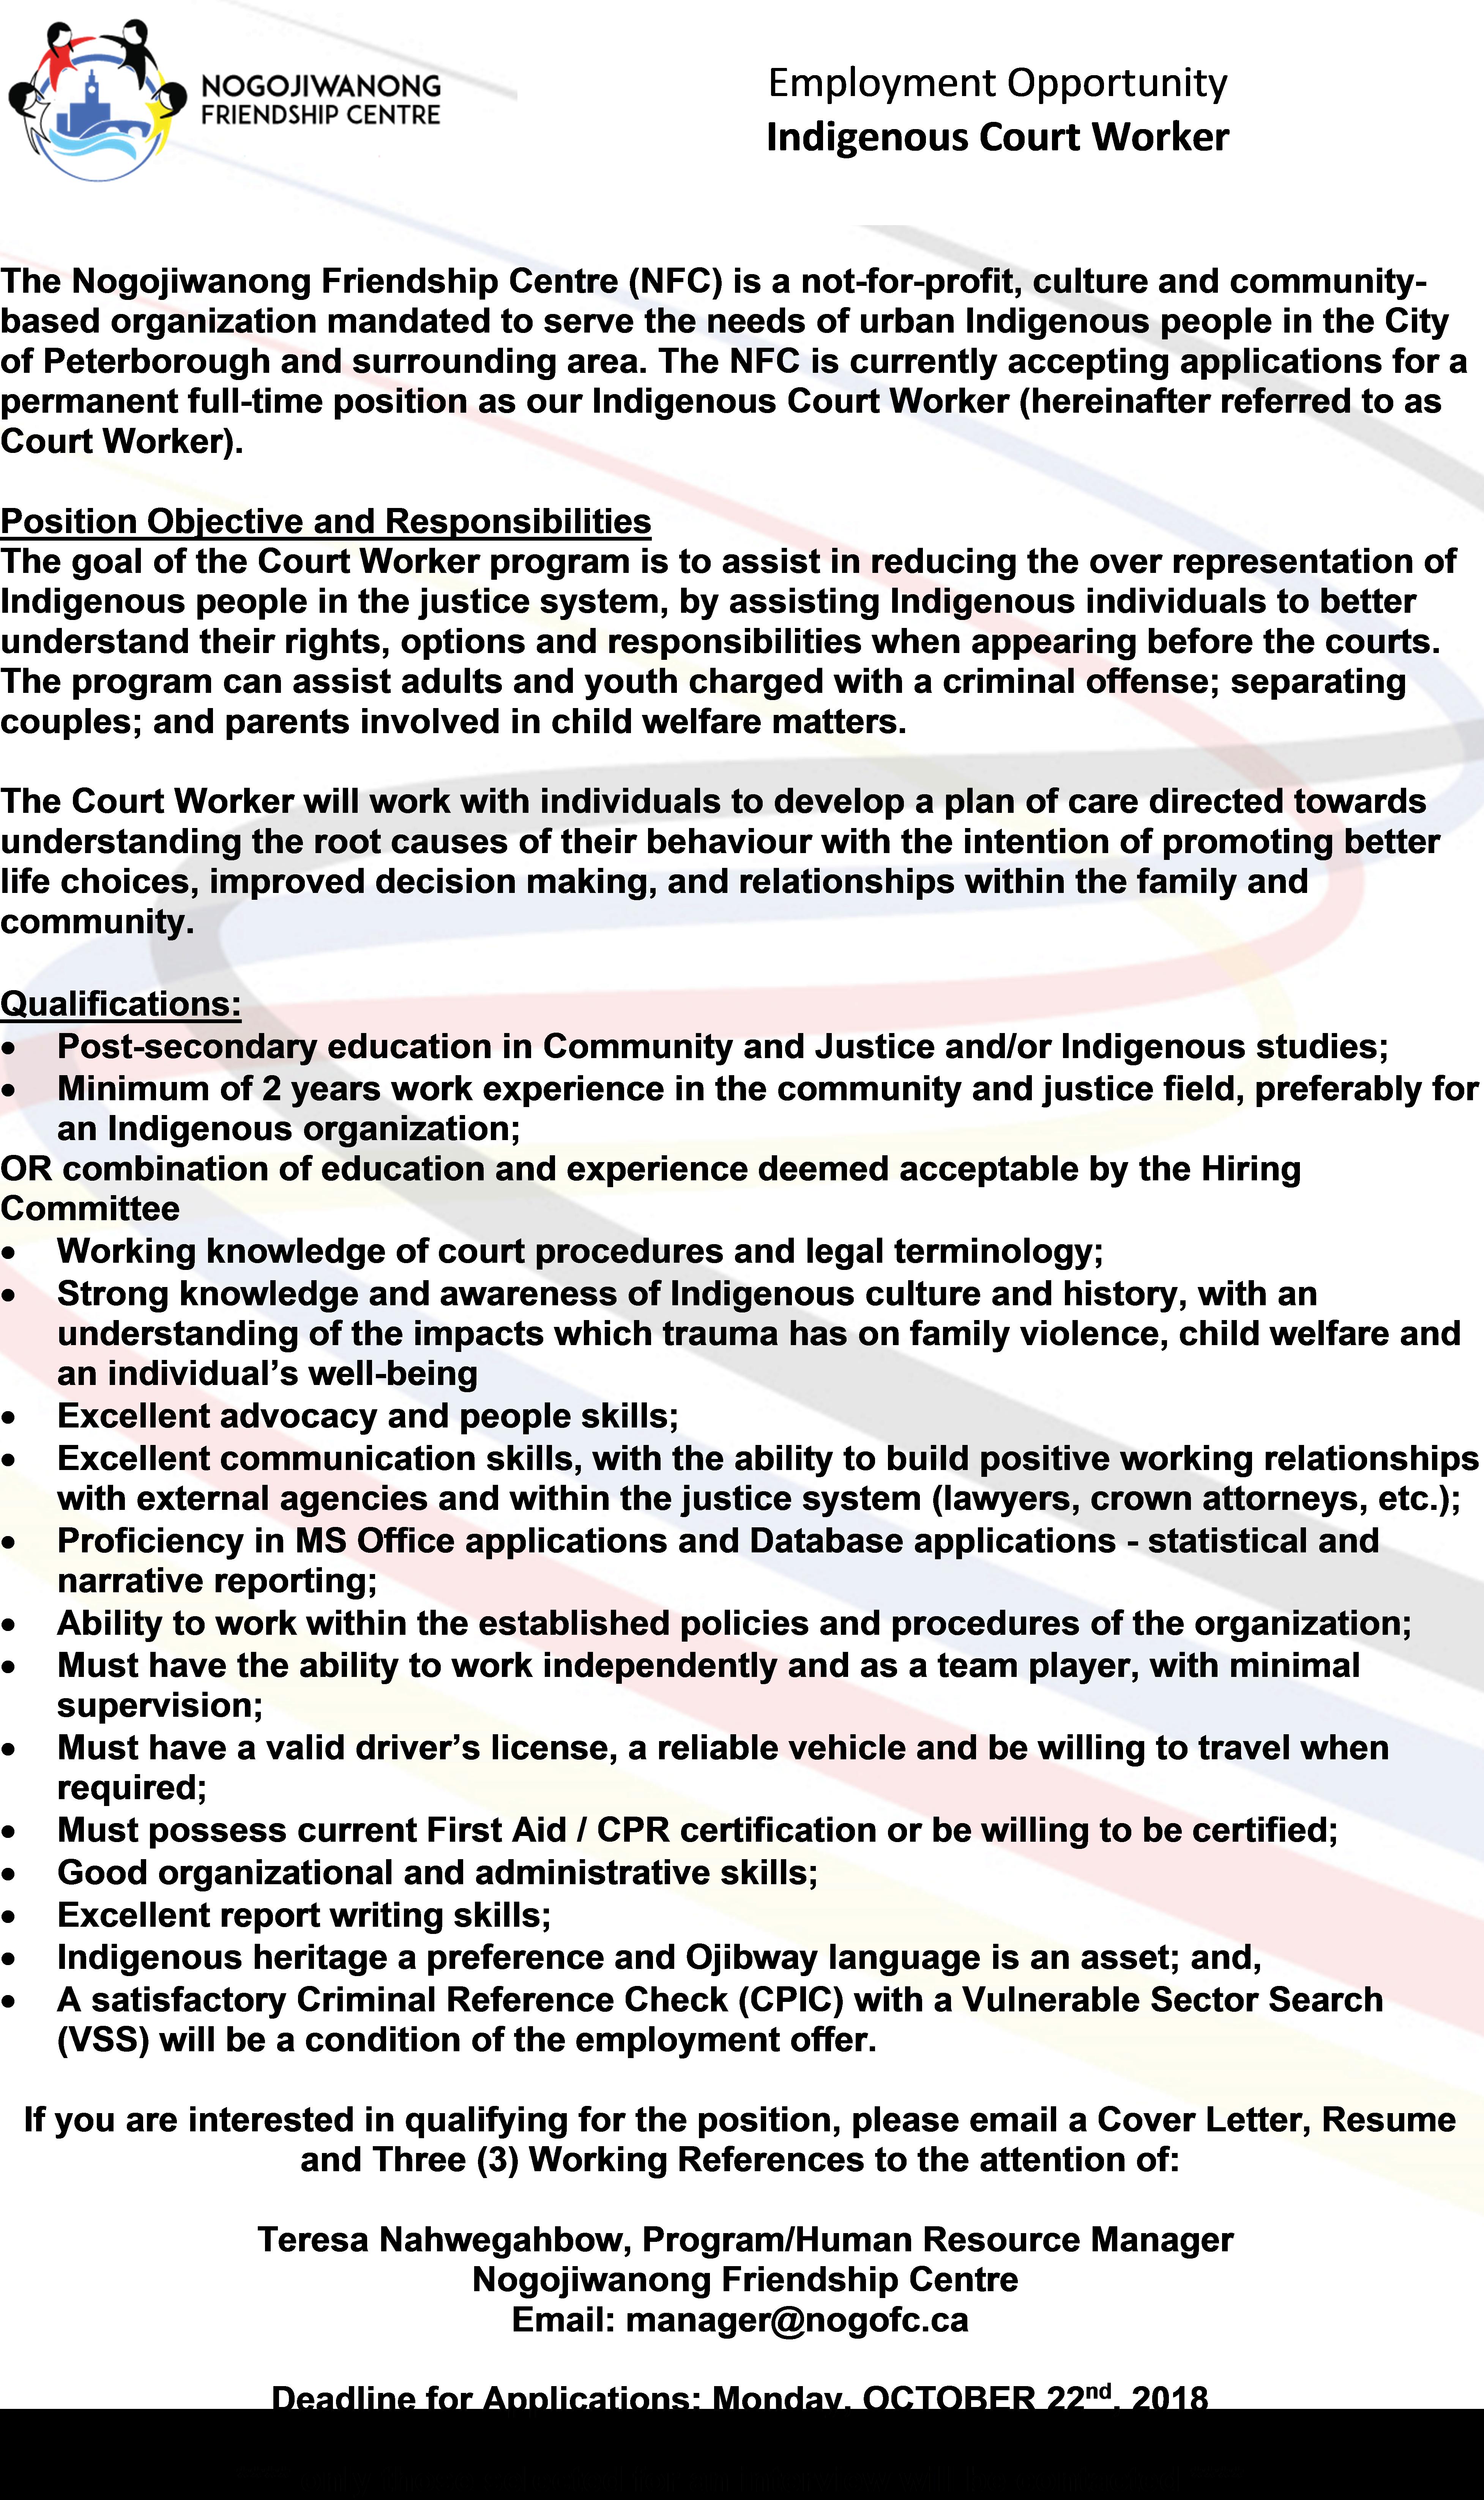 Employment Opportunity-Indigenous Court Worker | Nogojiwanong Friendship